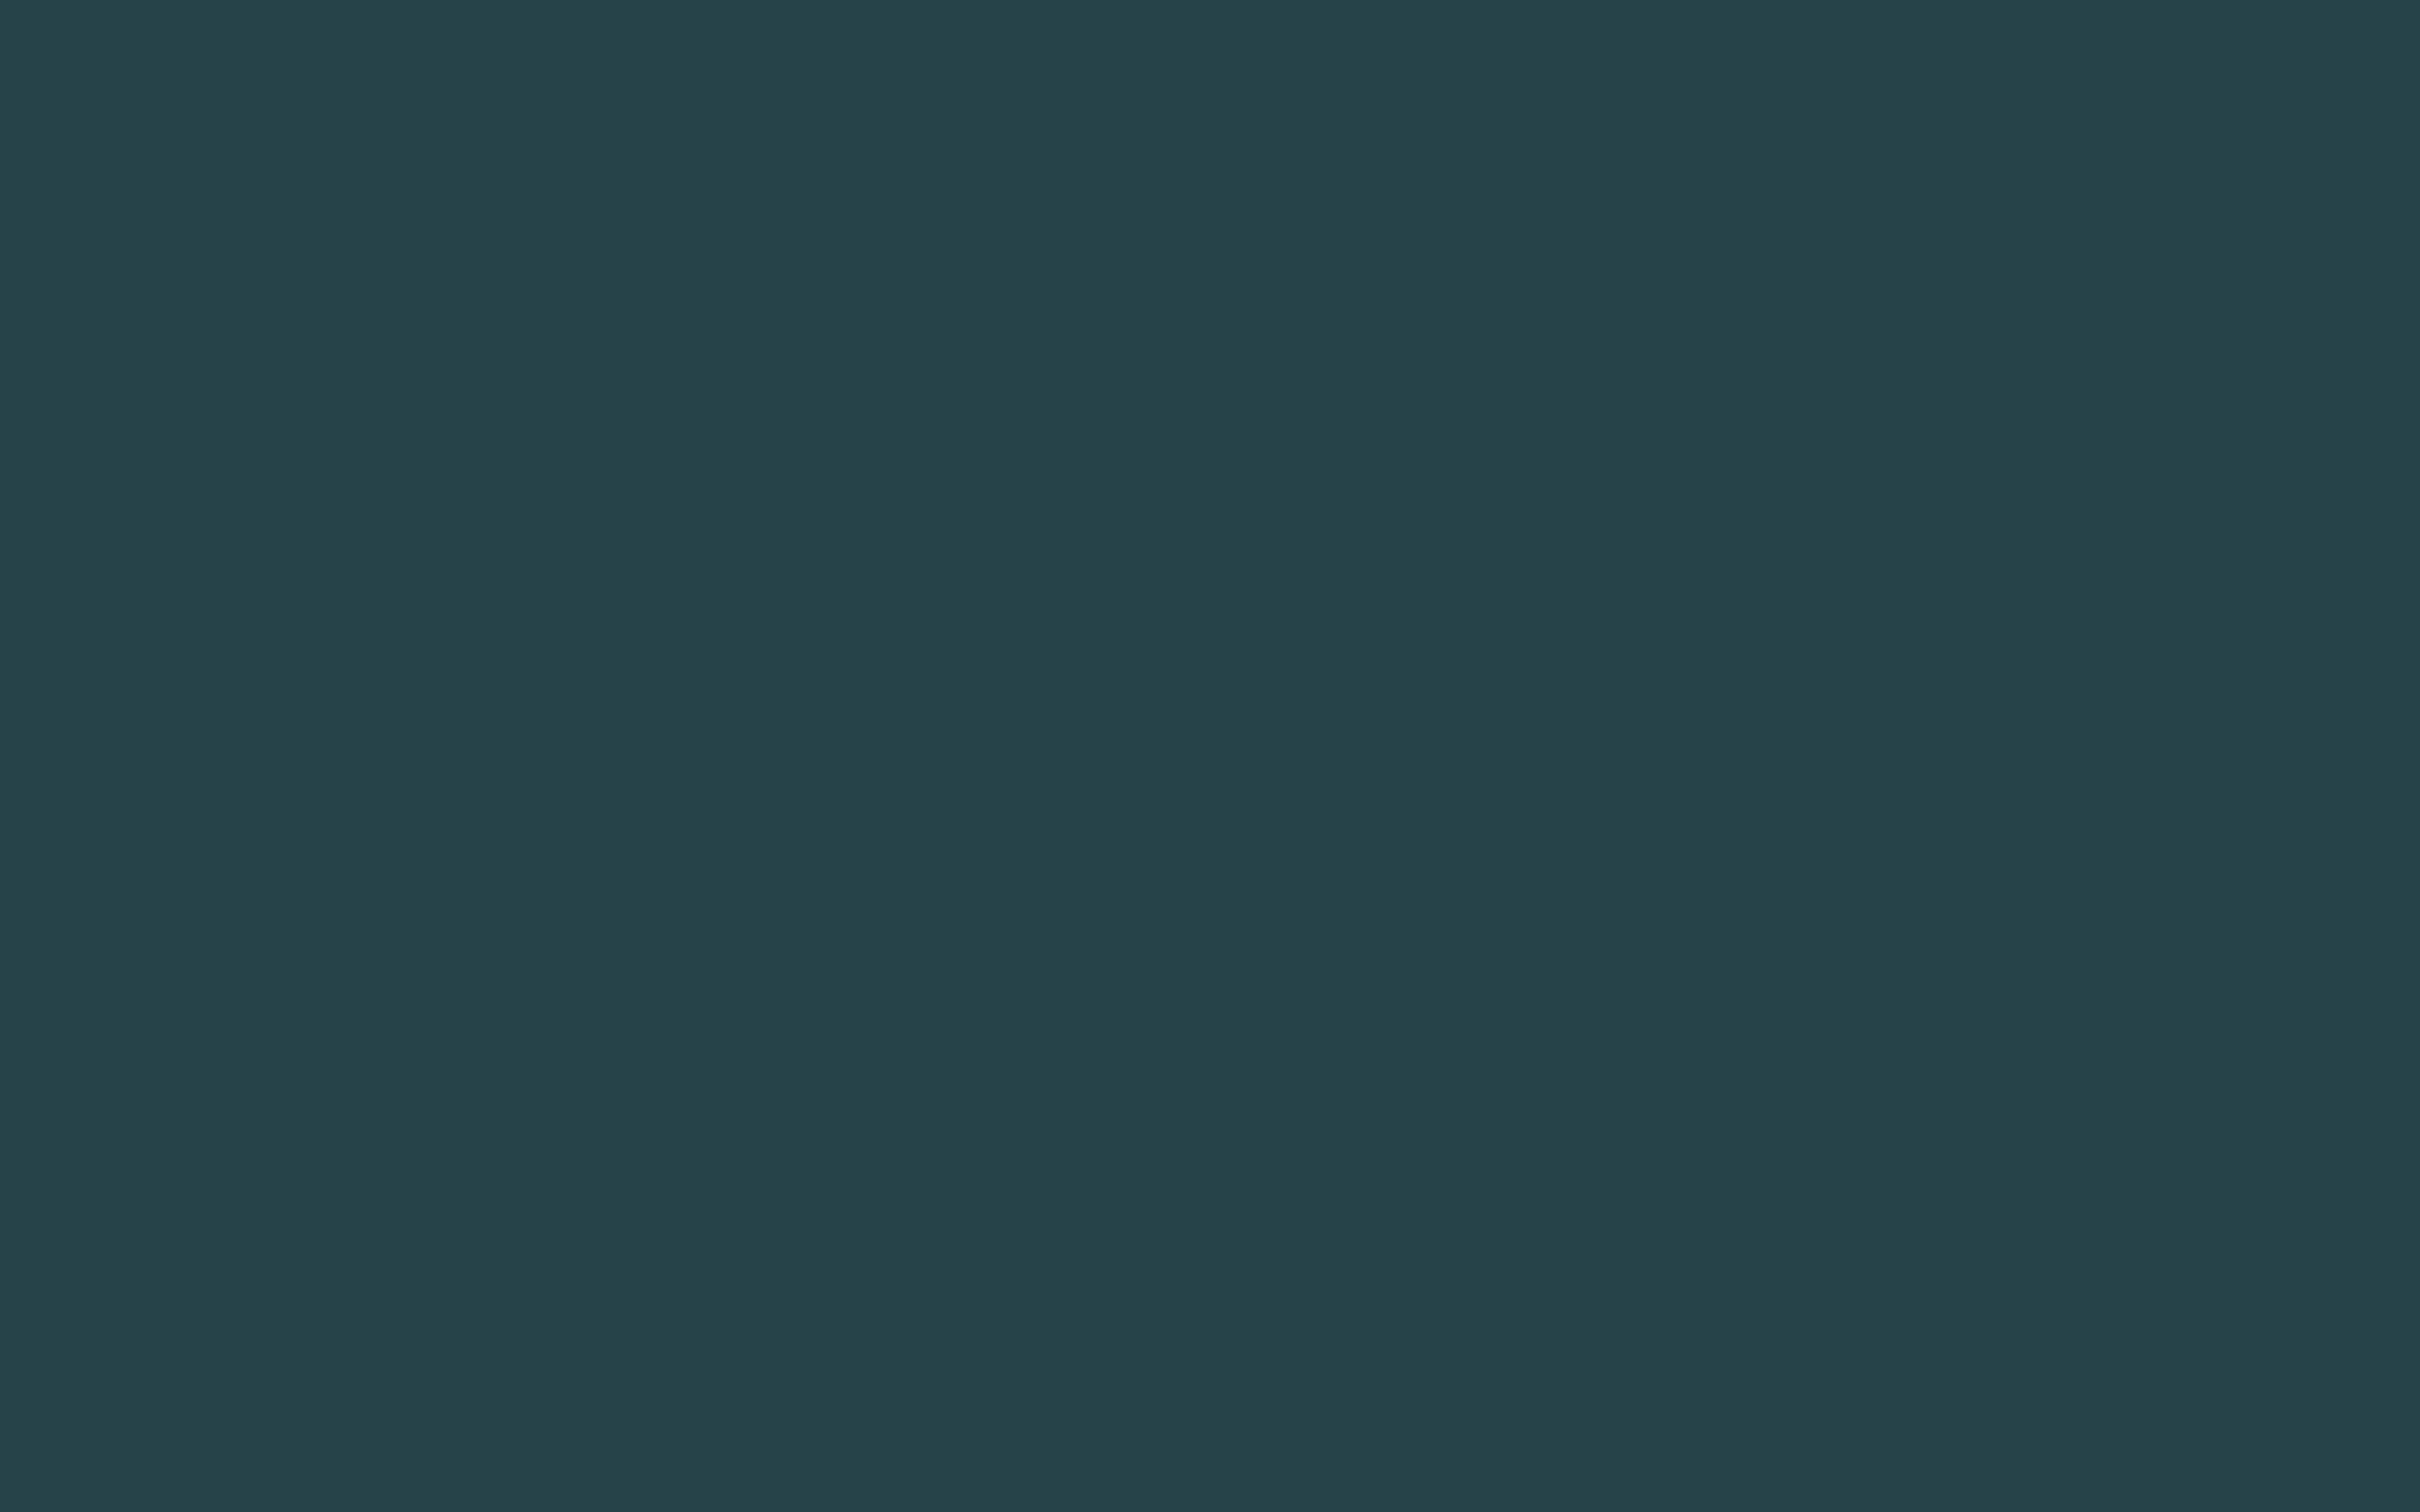 2560x1600 Japanese Indigo Solid Color Background